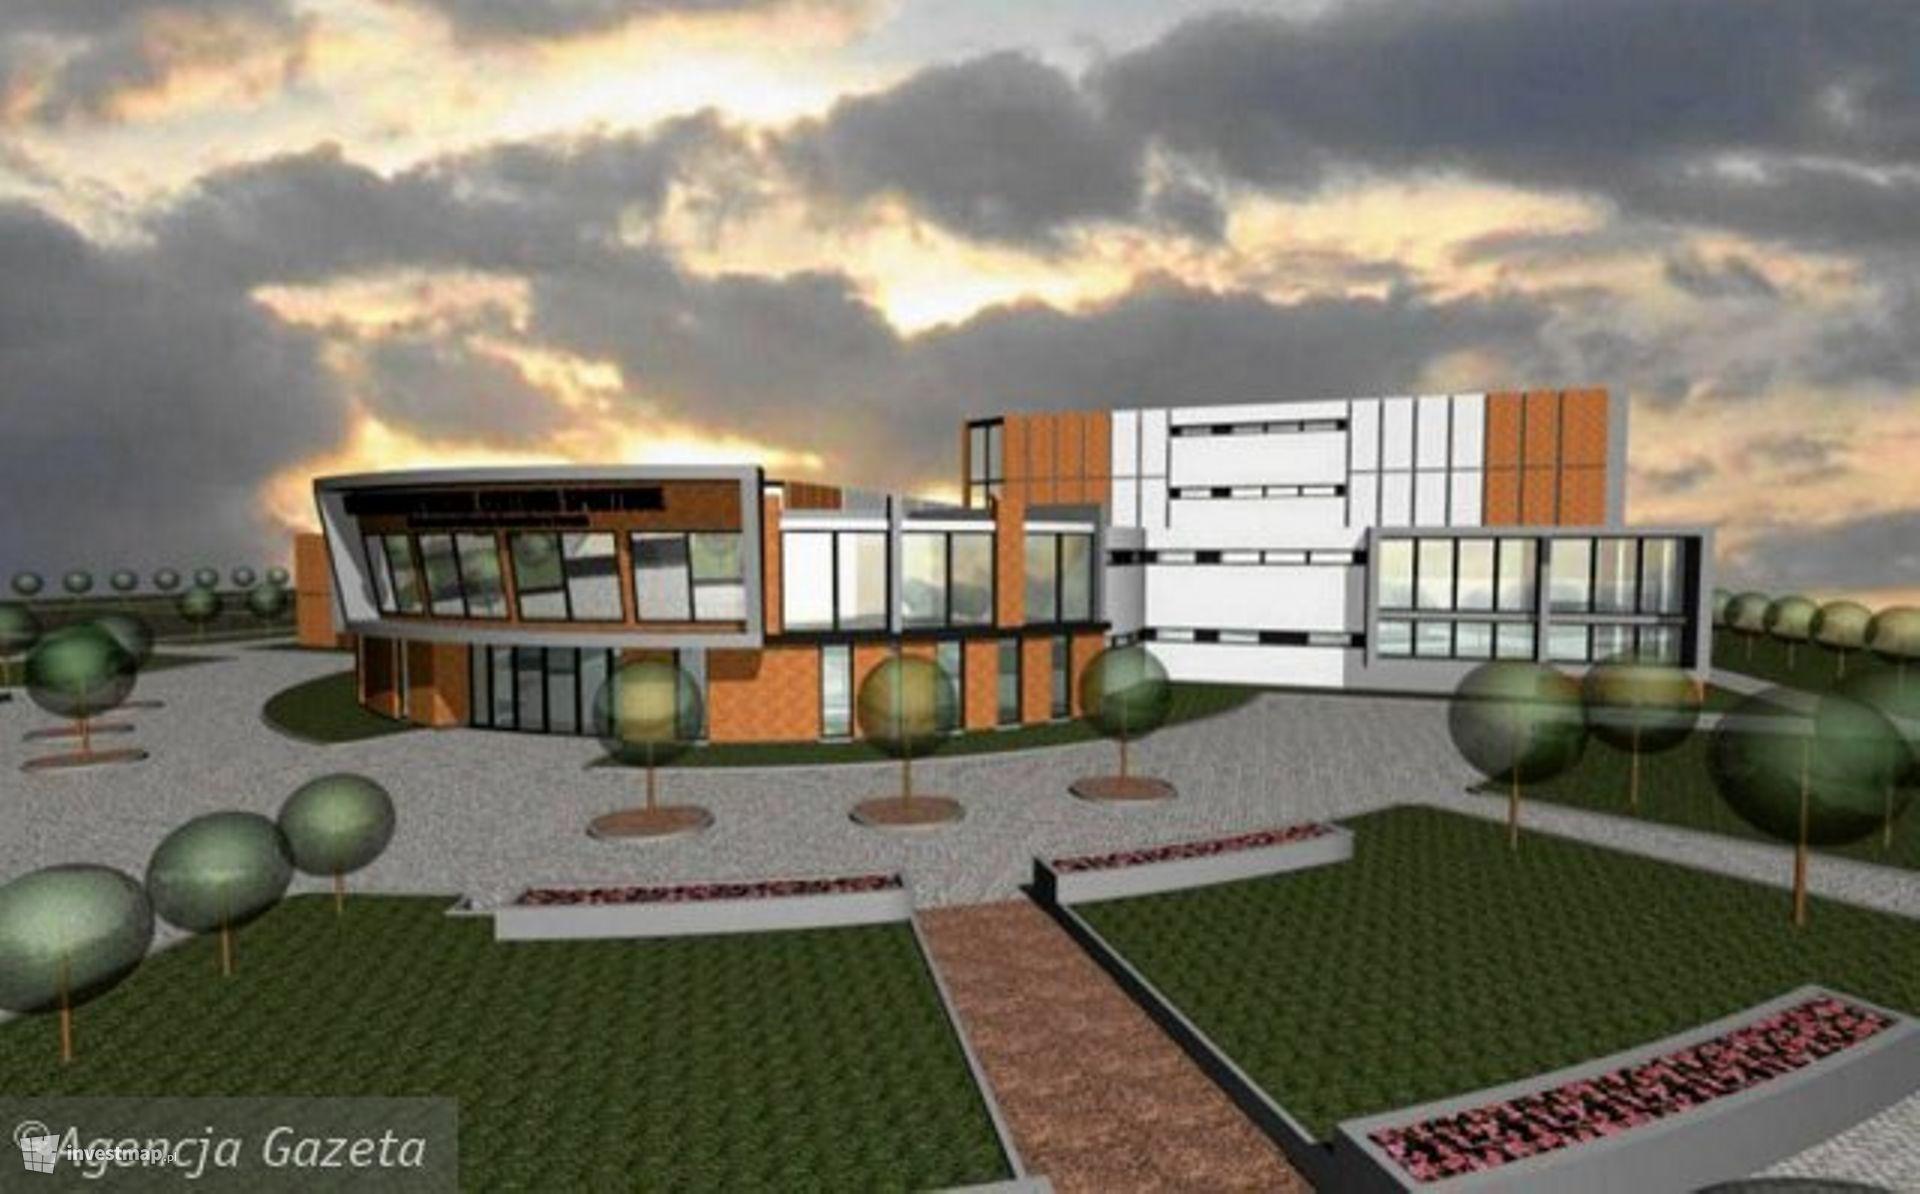 Uniwersyteckie Centrum Sportowe